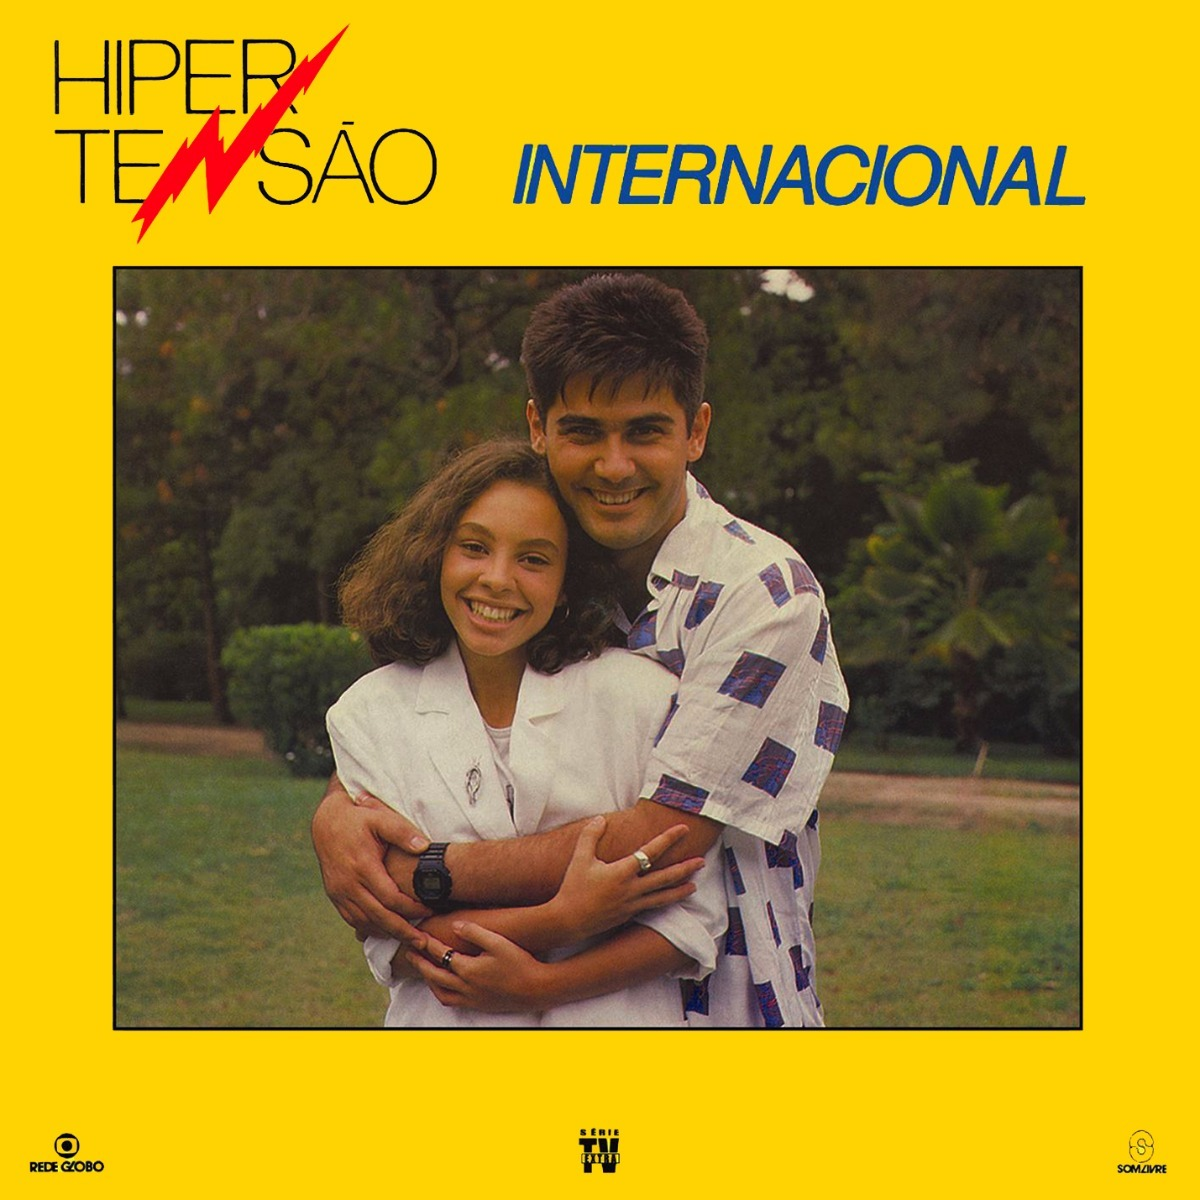 César Filho and Carla Marins in Hipertensão (1986)